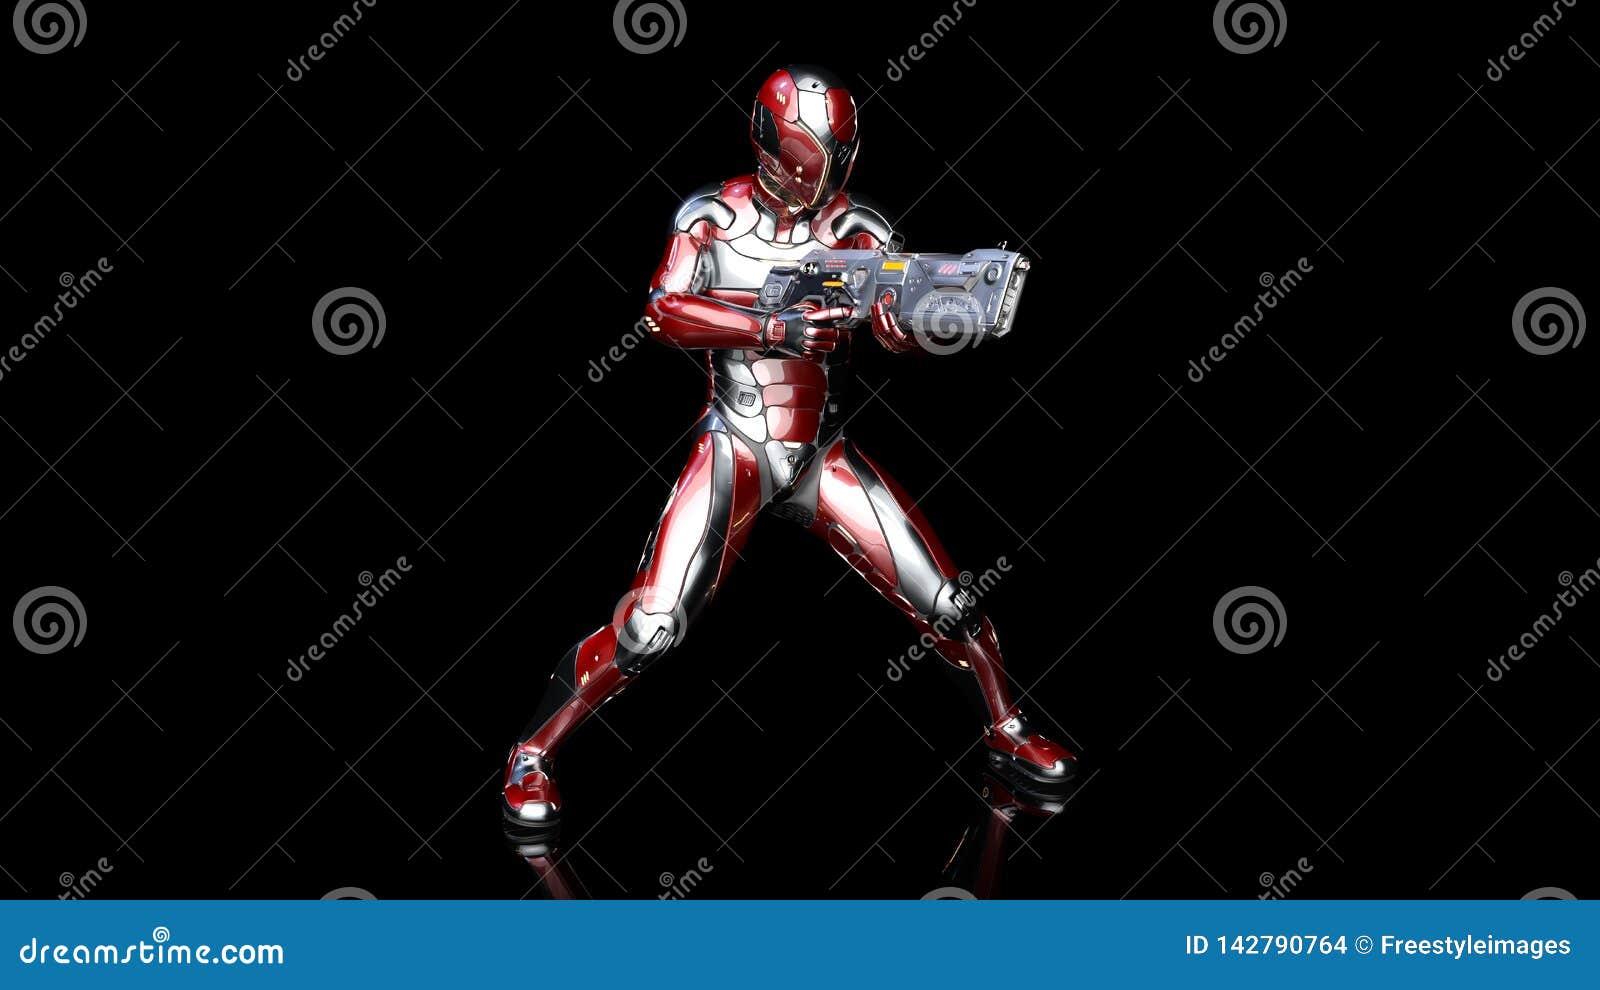 Futuristische androïde militair in kogelvrij pantser, militaire cyborg die met sc.i-FI geweerkanon wordt bewapend die op zwarte 3